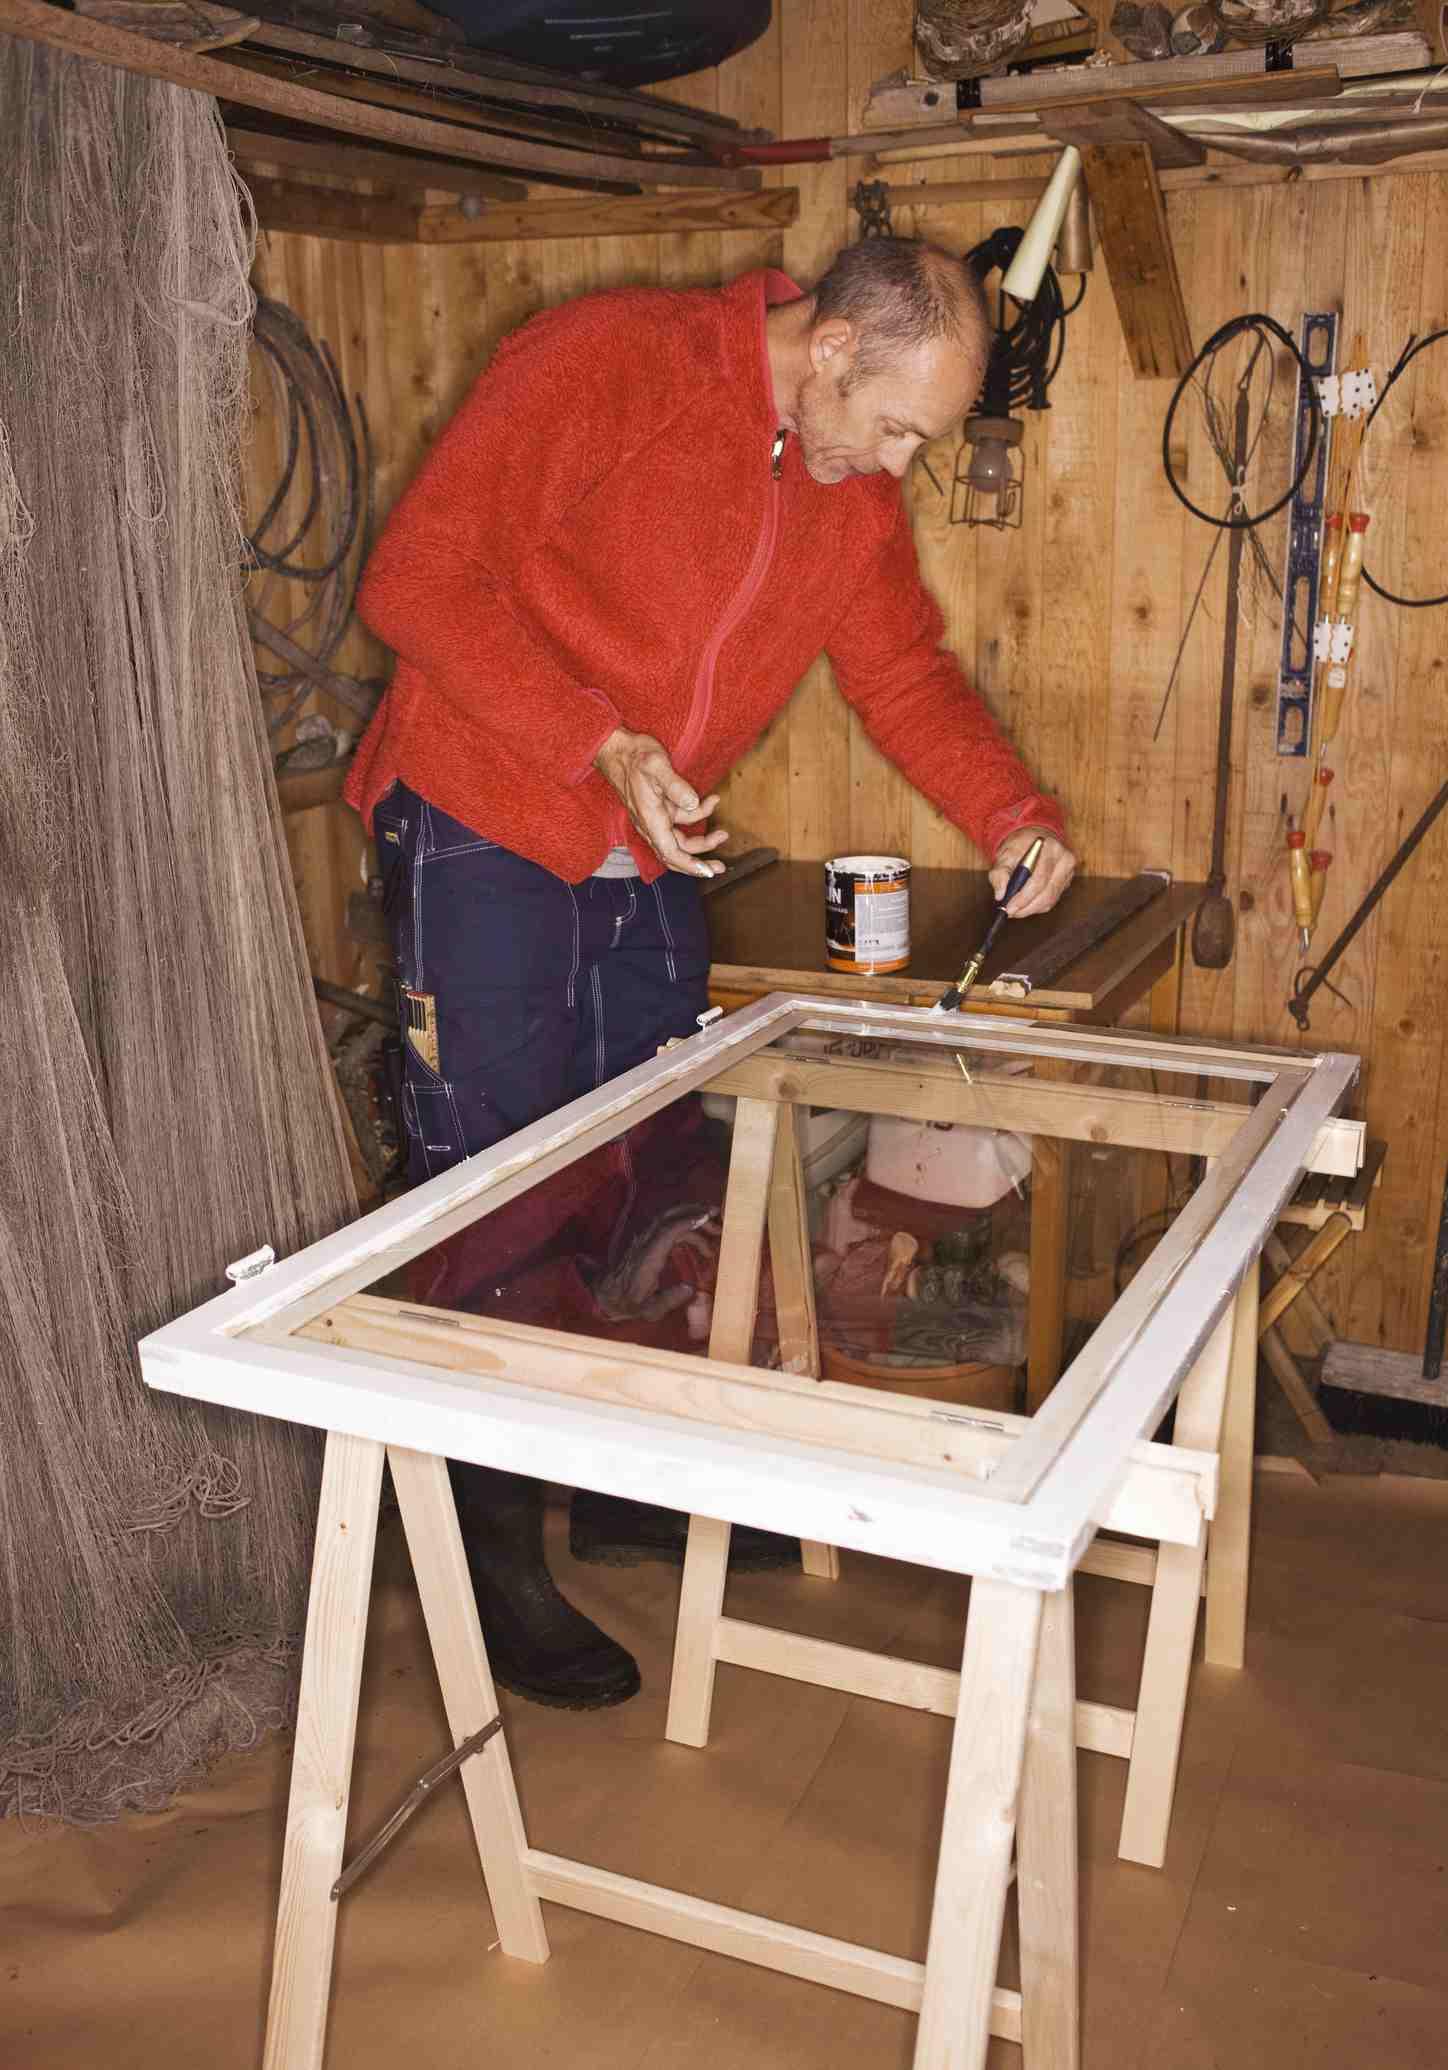 A man preparing a new window